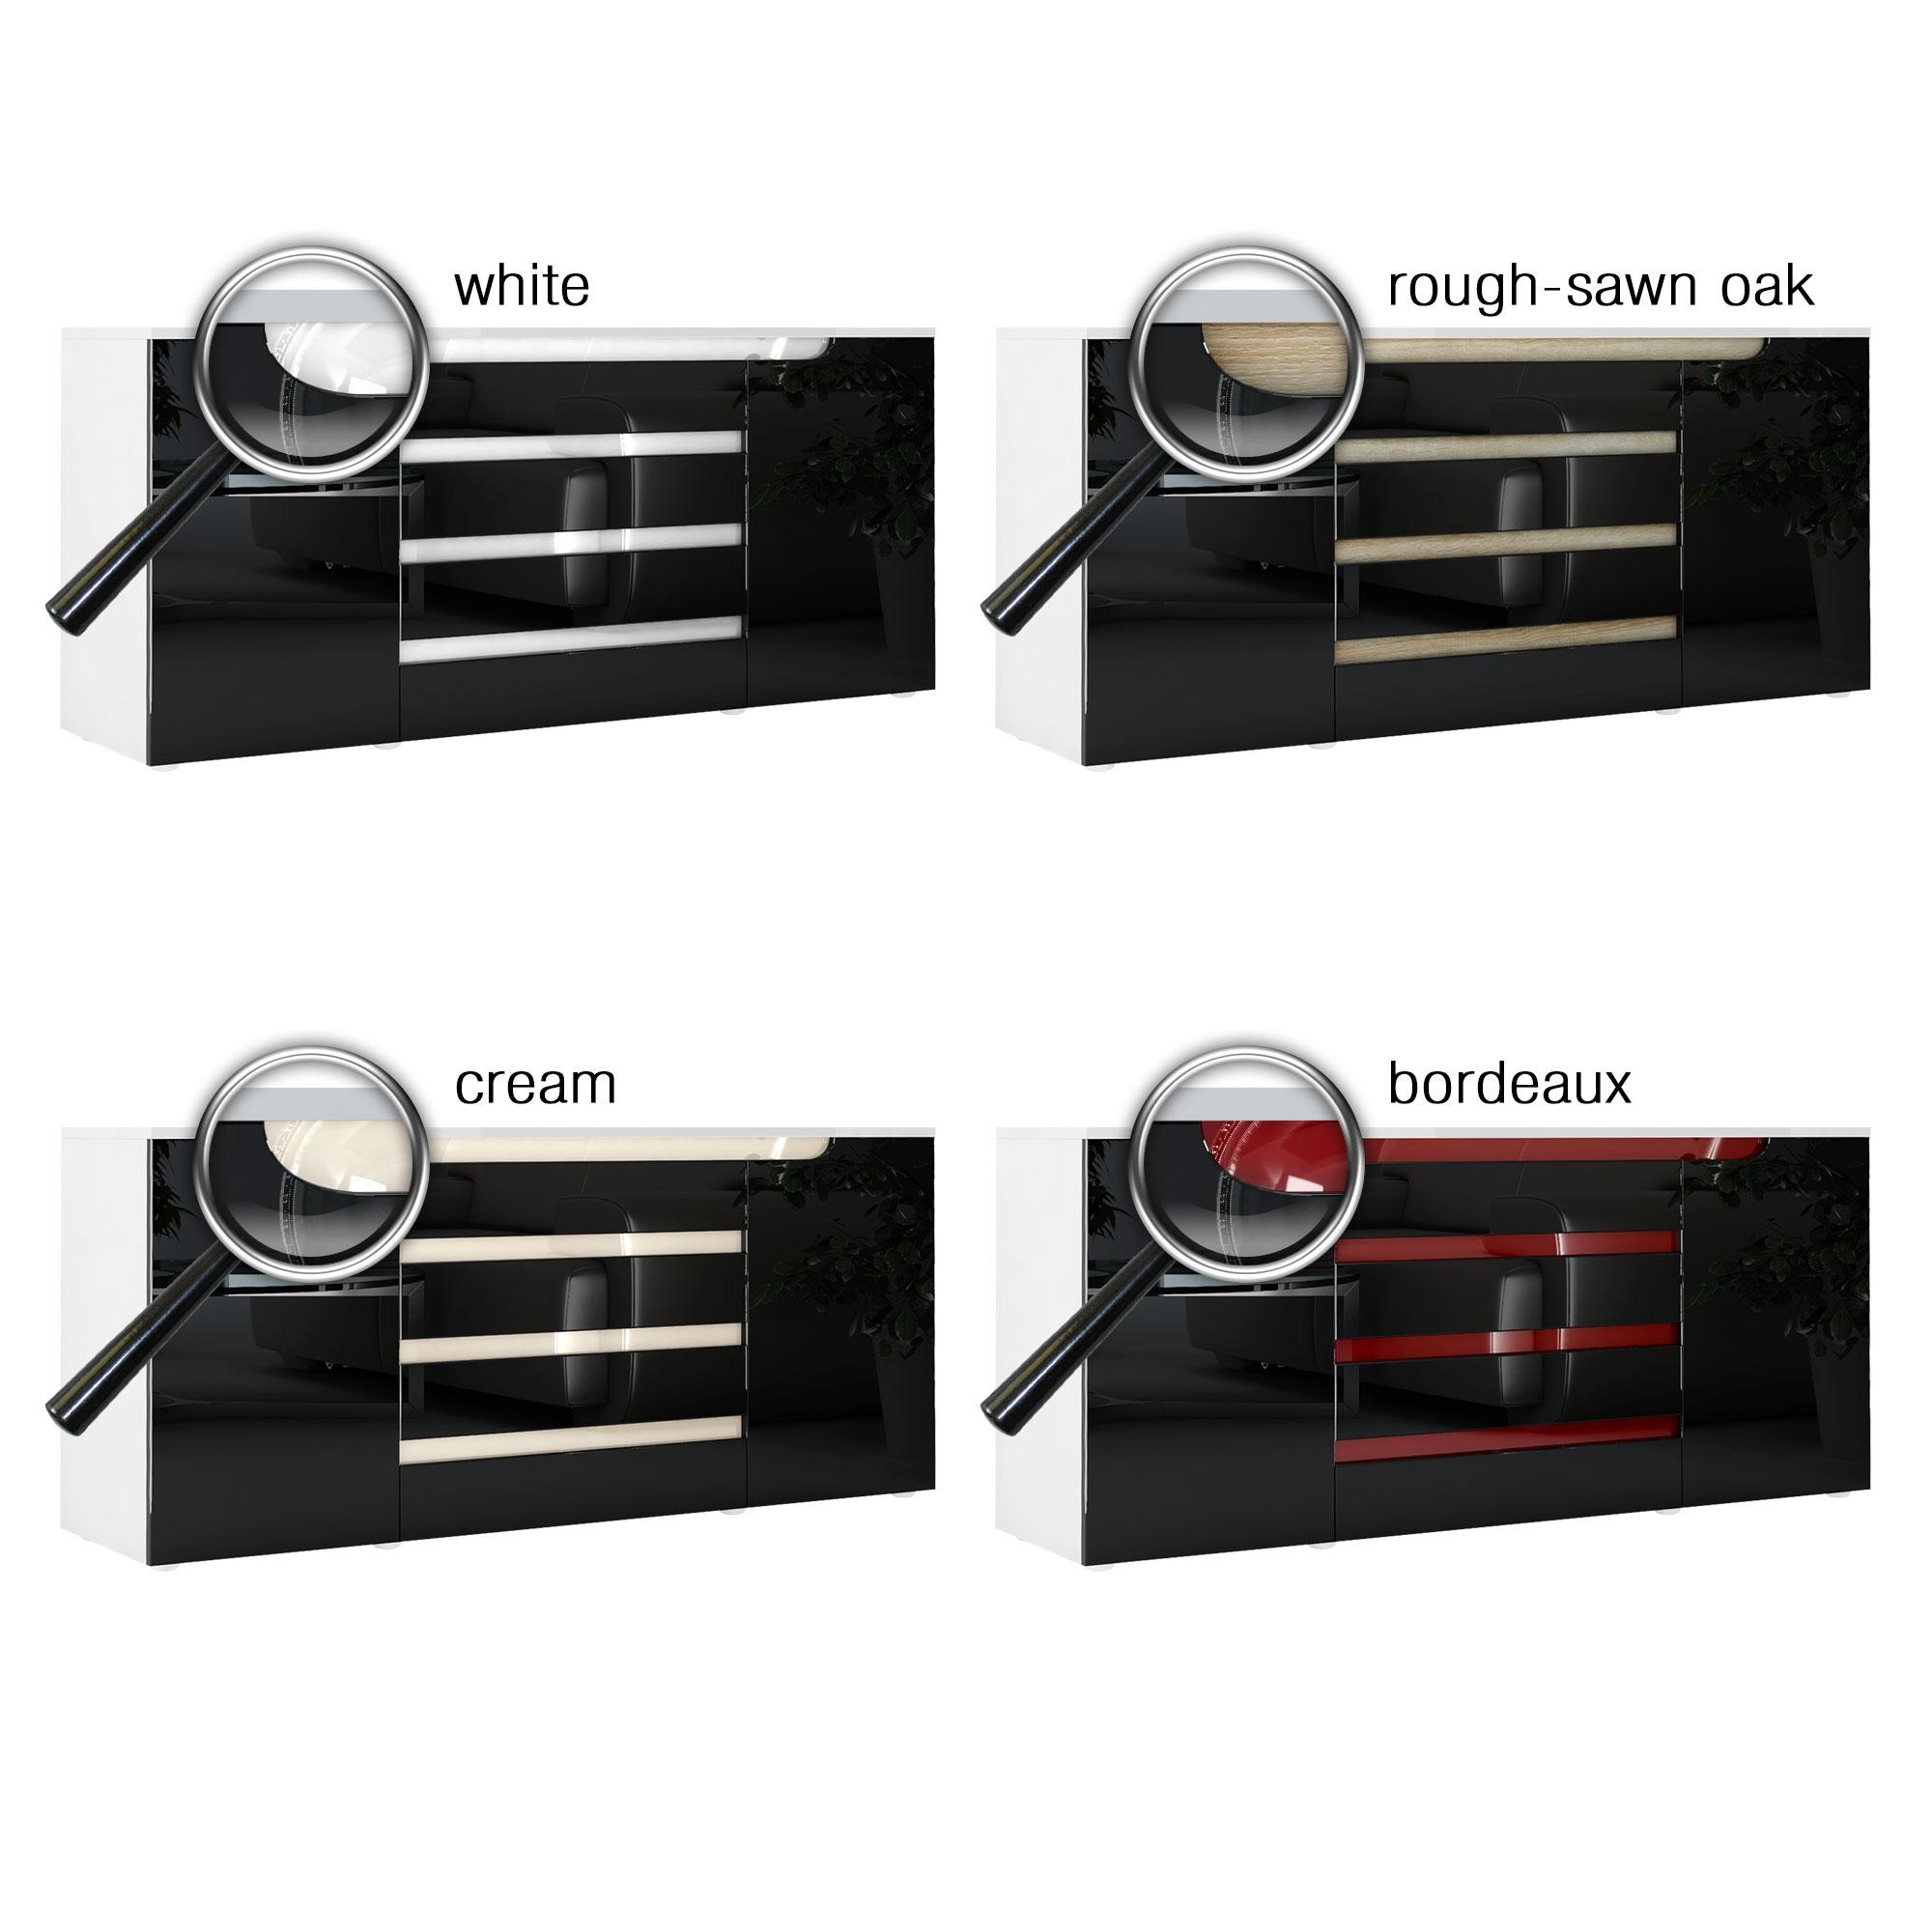 sideboard chest of drawers cabinet sylt v2 white high gloss natural tones ebay. Black Bedroom Furniture Sets. Home Design Ideas